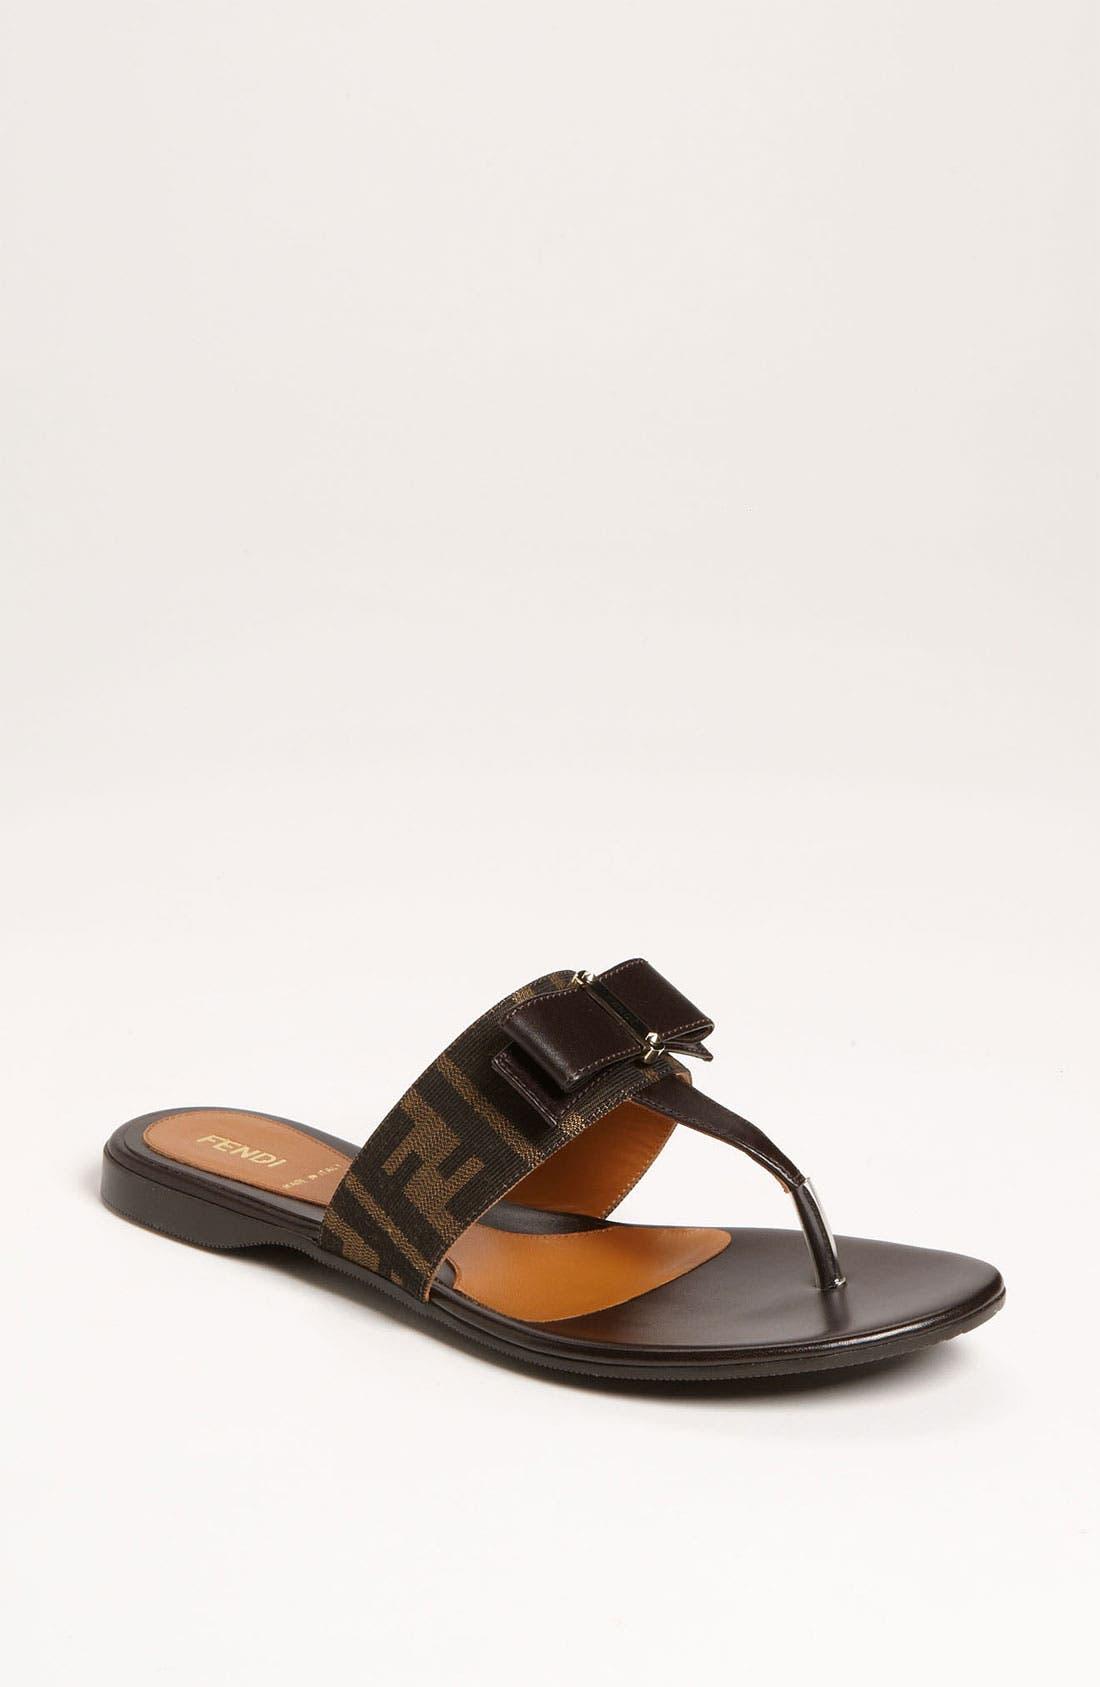 Main Image - Fendi 'Crayons' Sandal